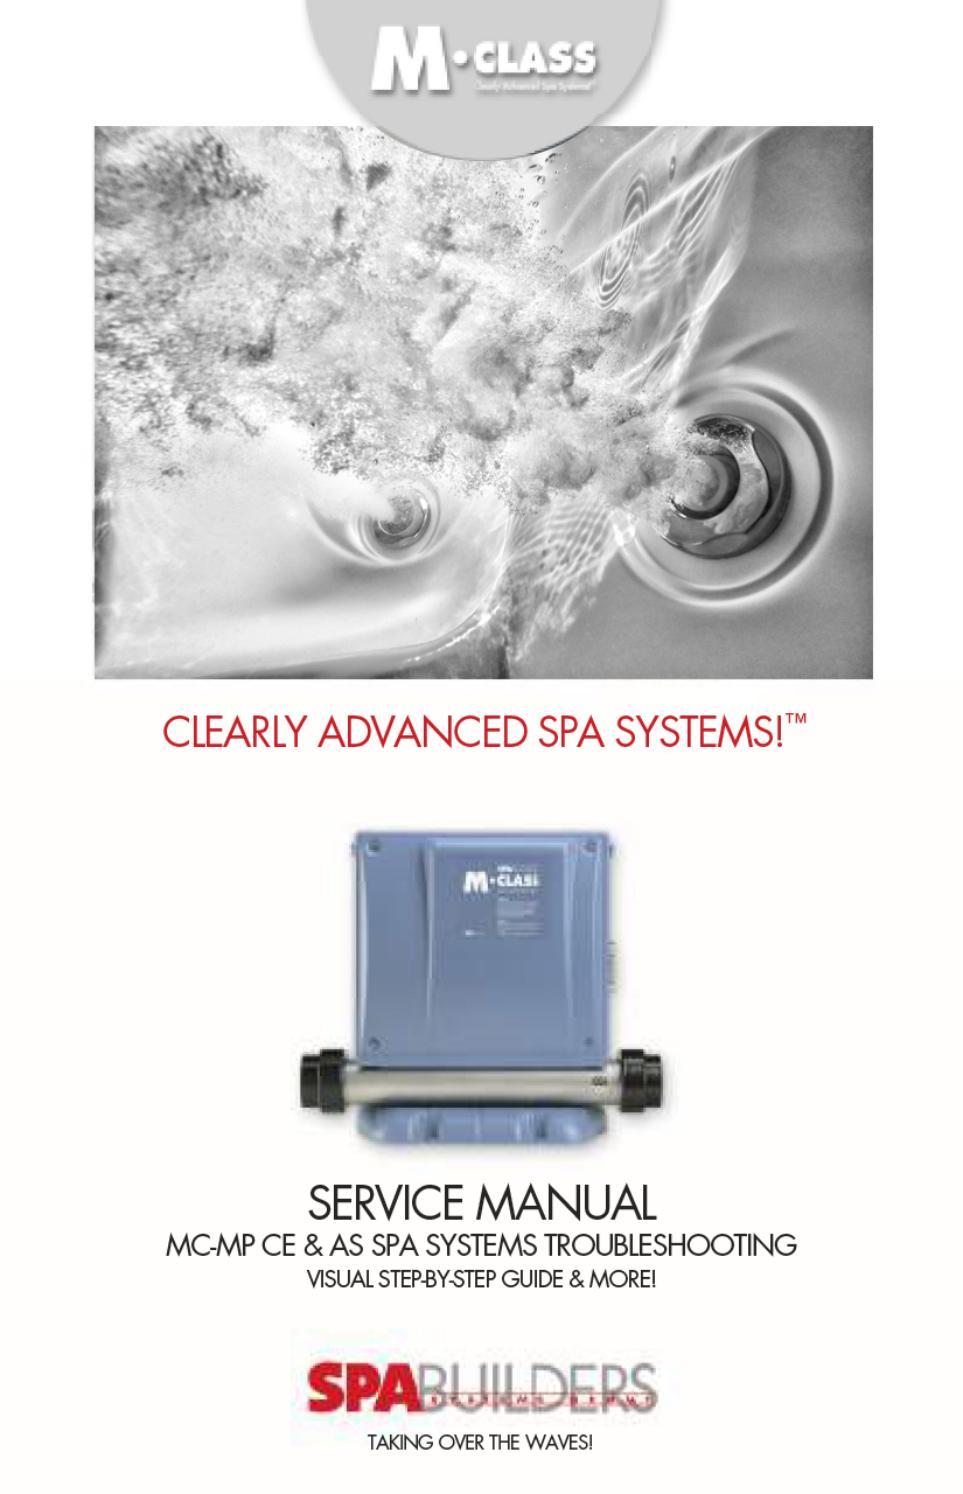 medium resolution of m class mc mp ce control system service manual